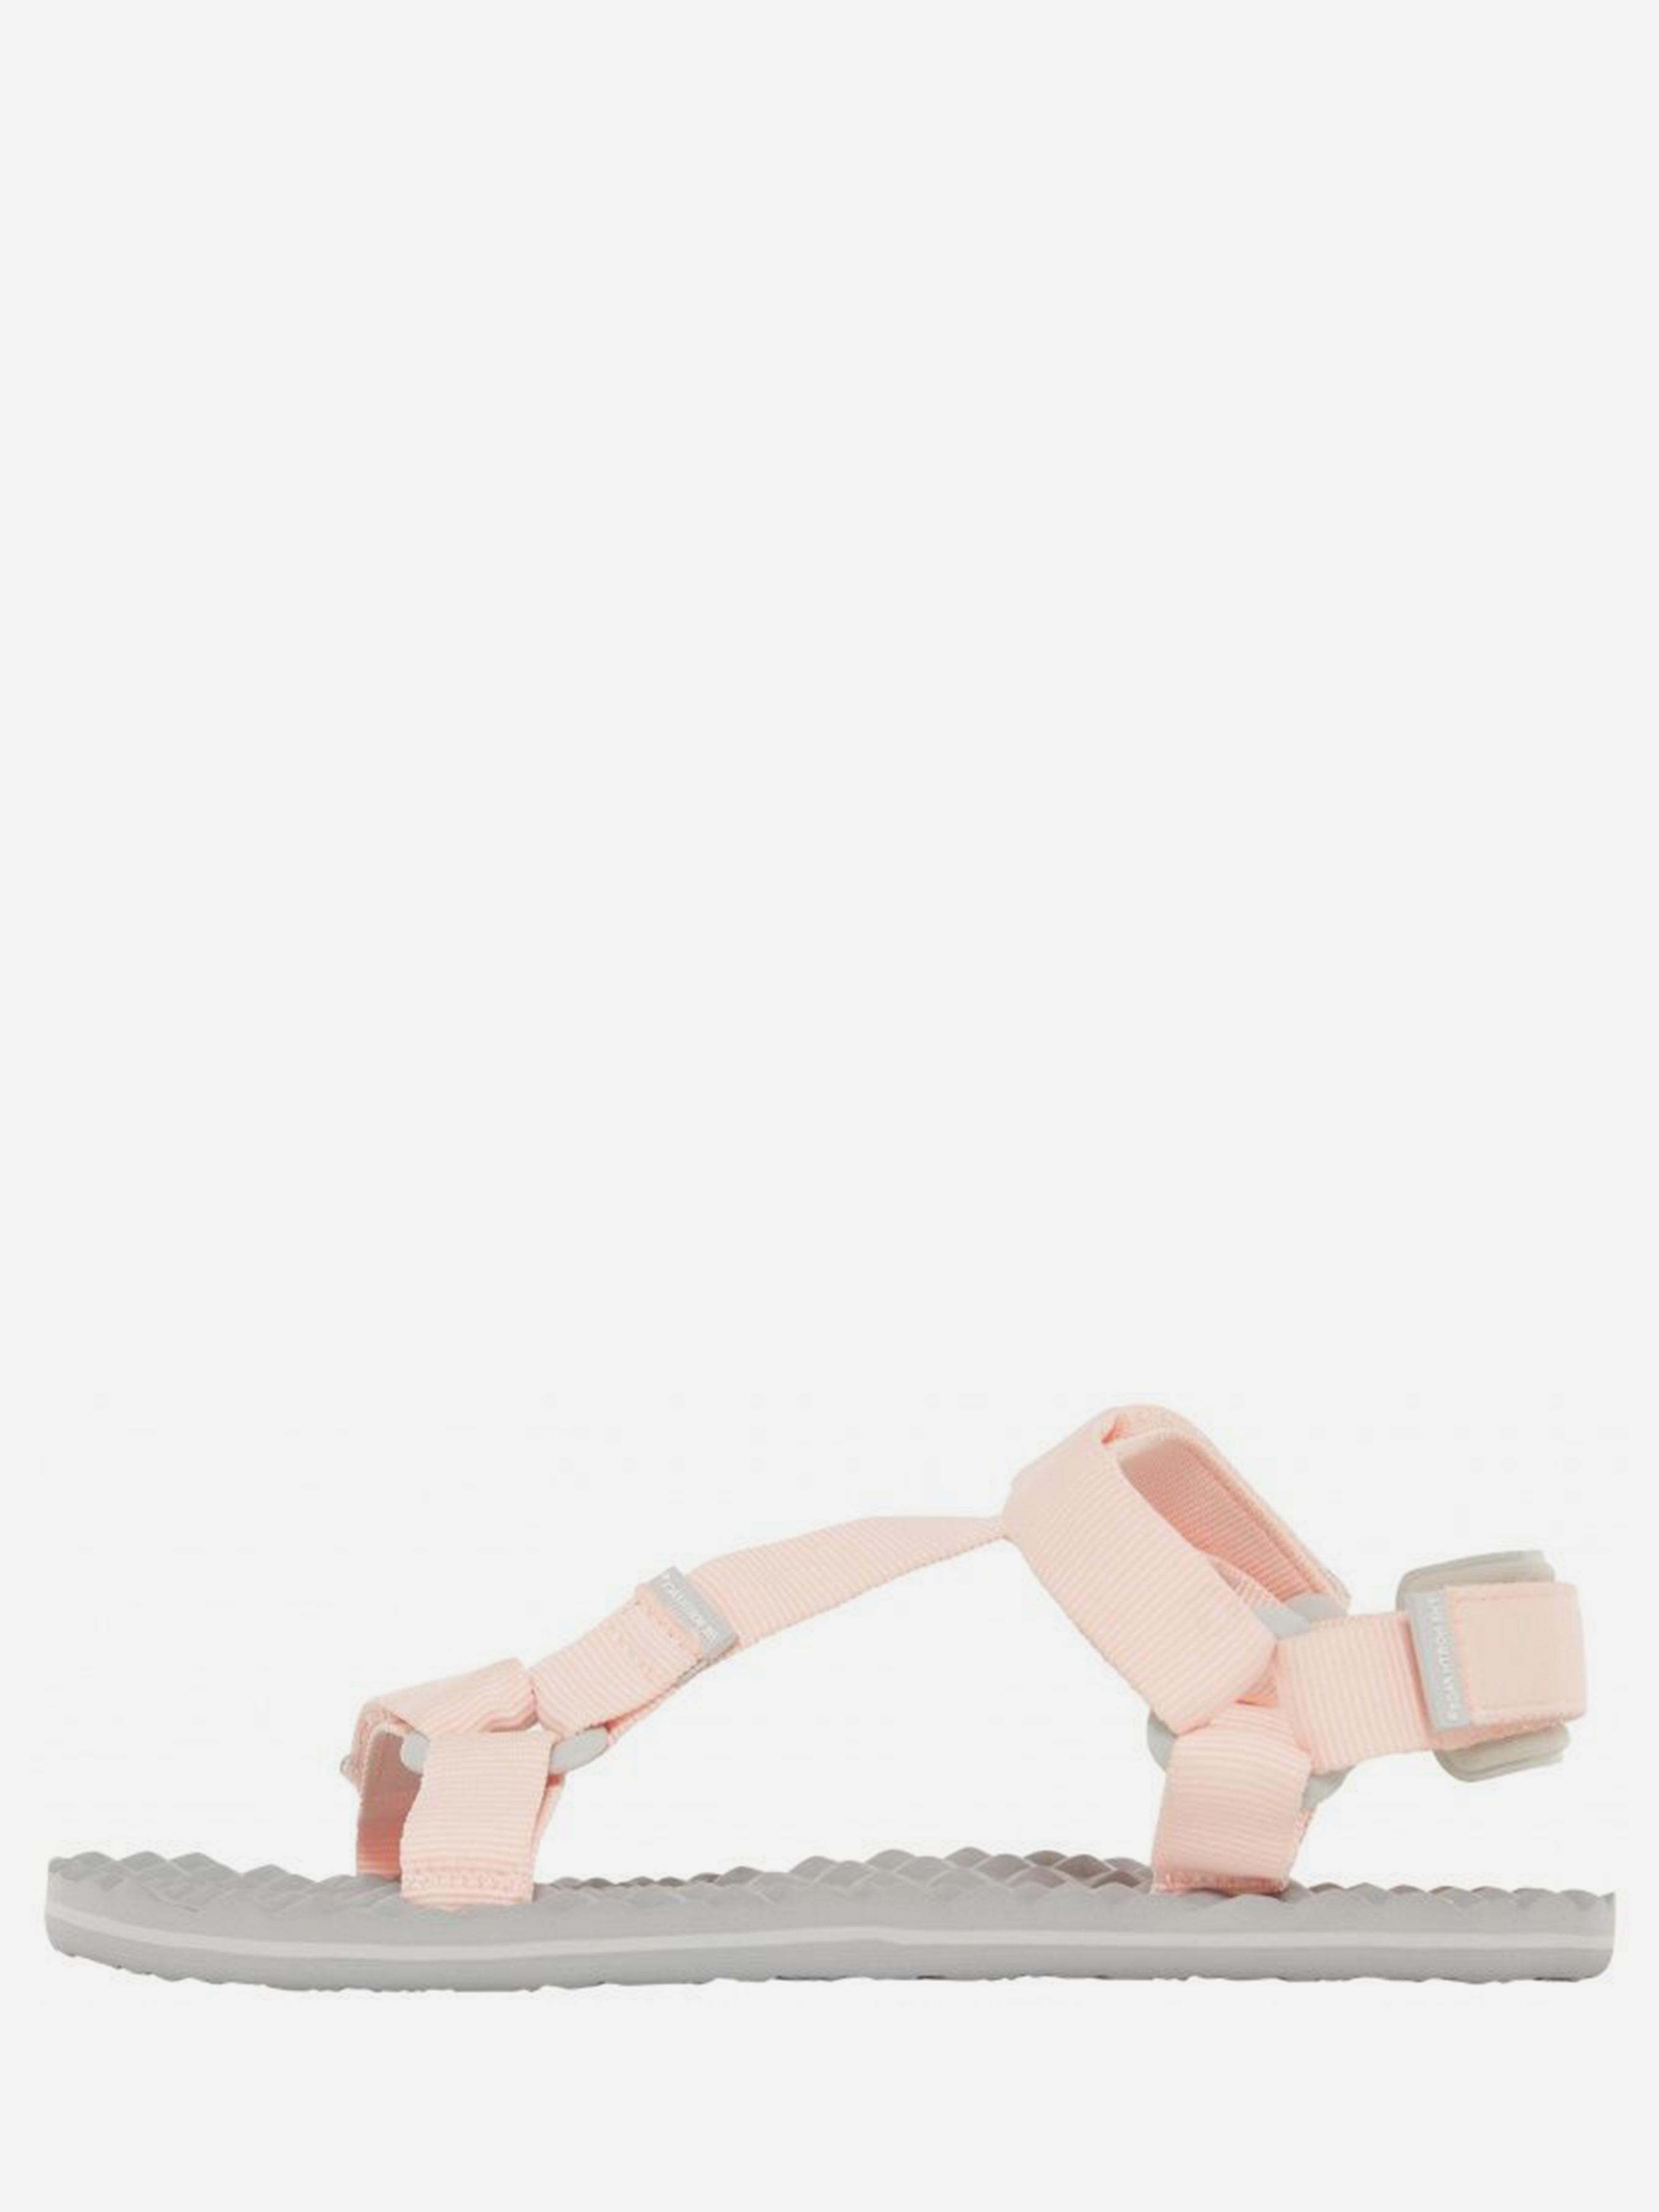 Сандалии для женщин The North Face BASECMP SWITCHBACK NO9735 брендовая обувь, 2017